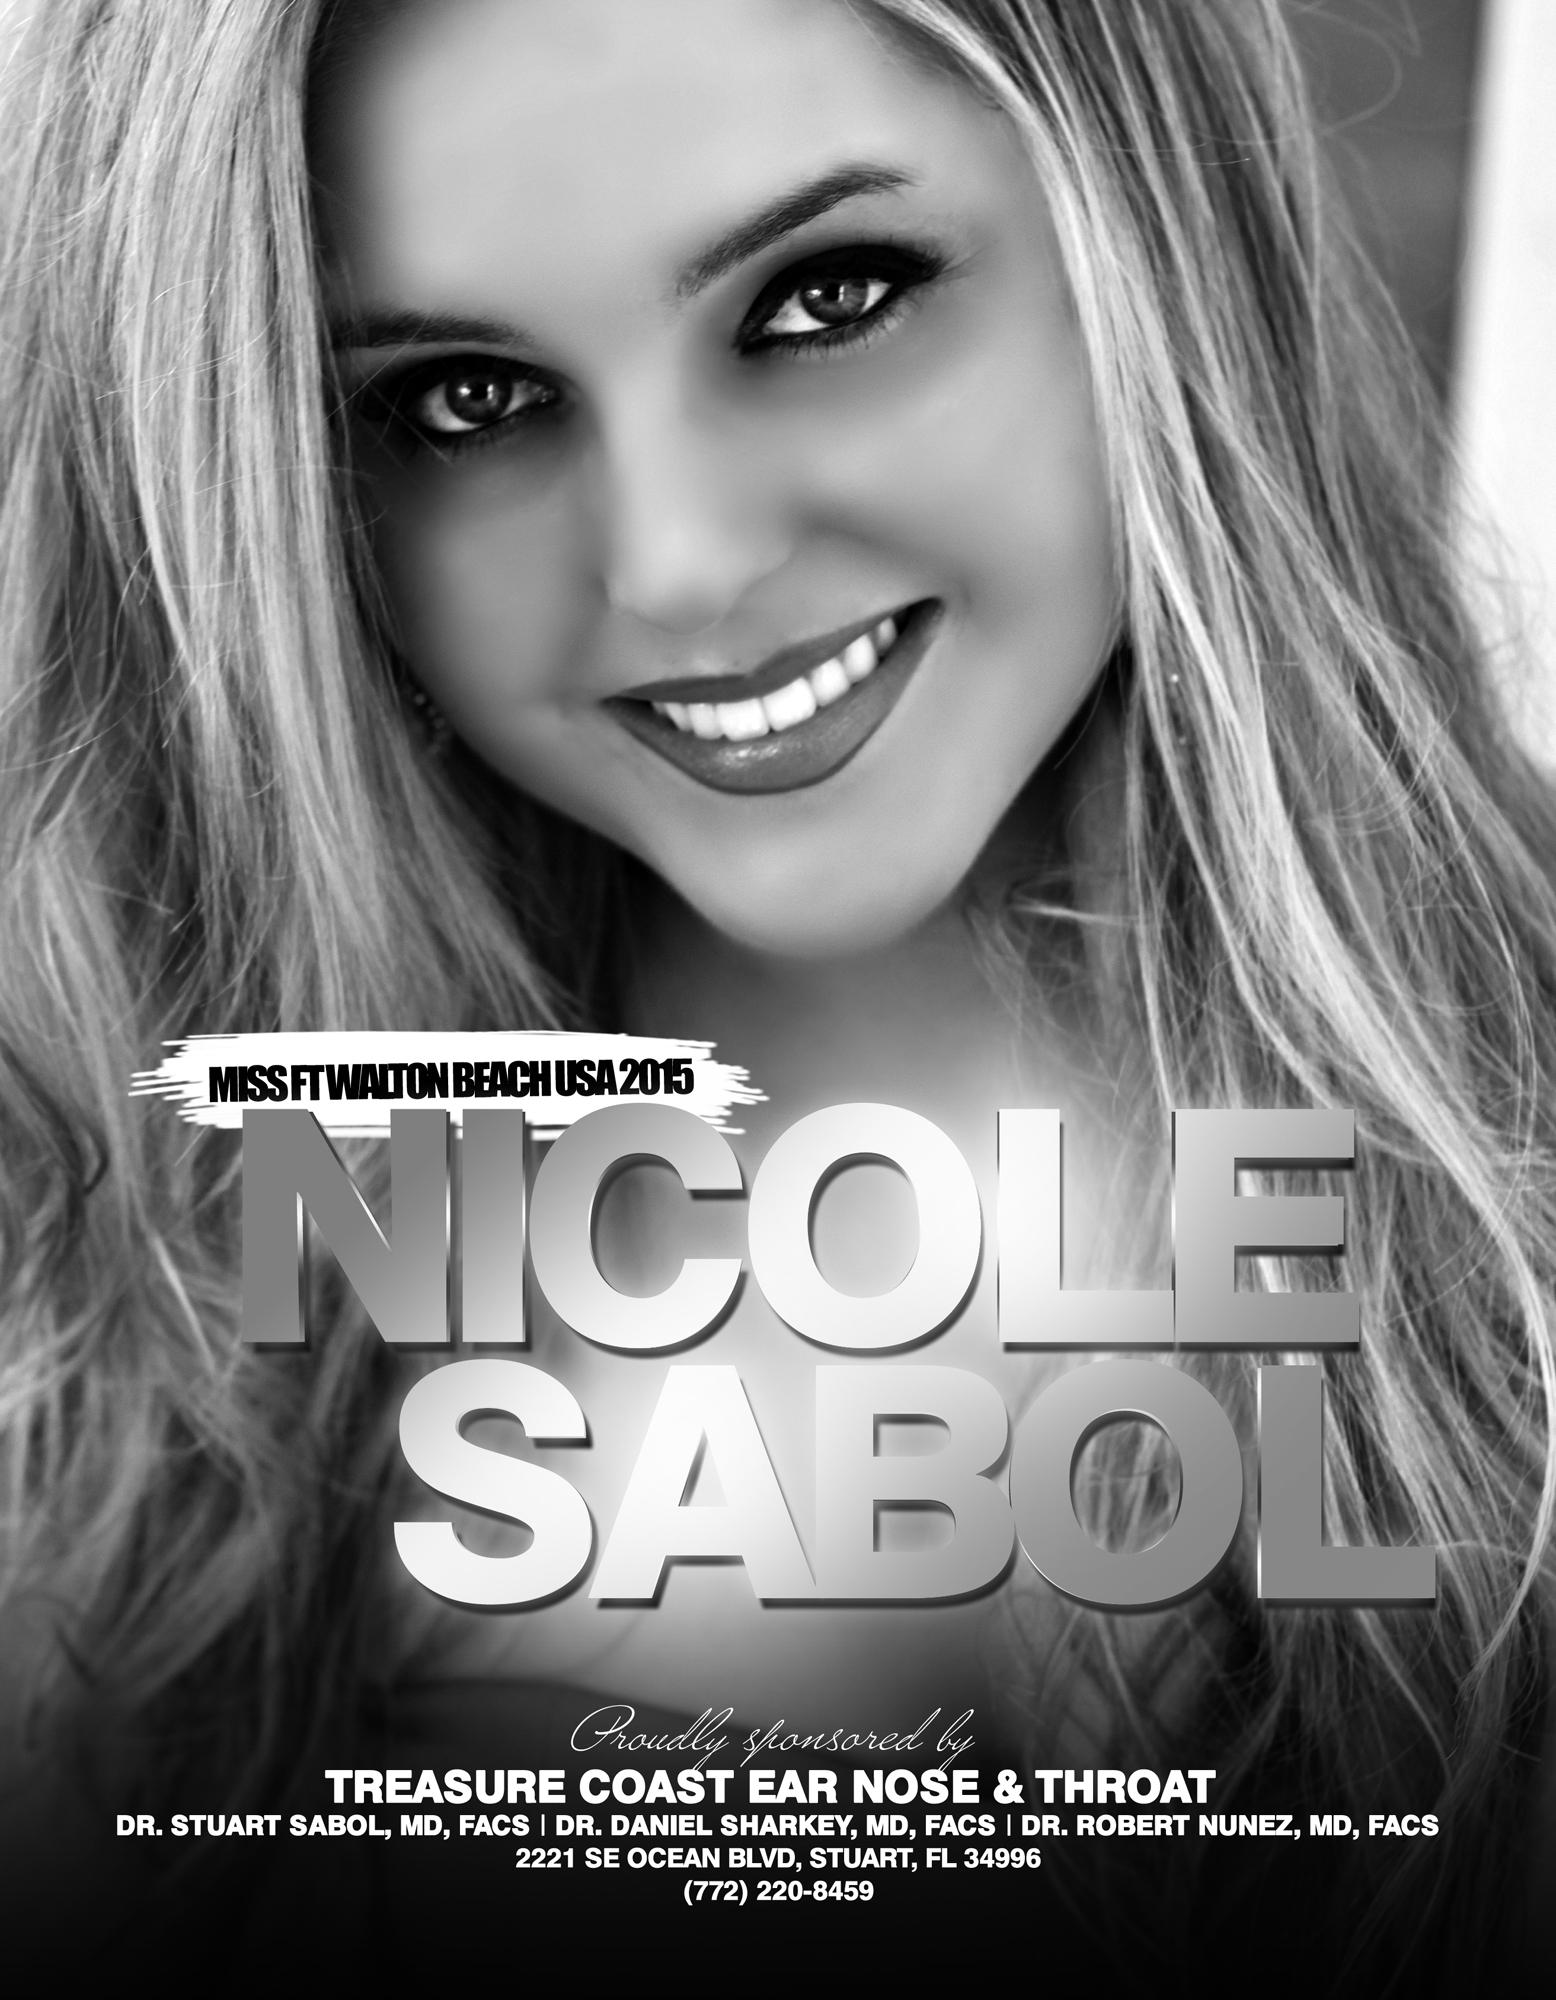 NICOLE SABOL / MISS FT. WALTON BEACH